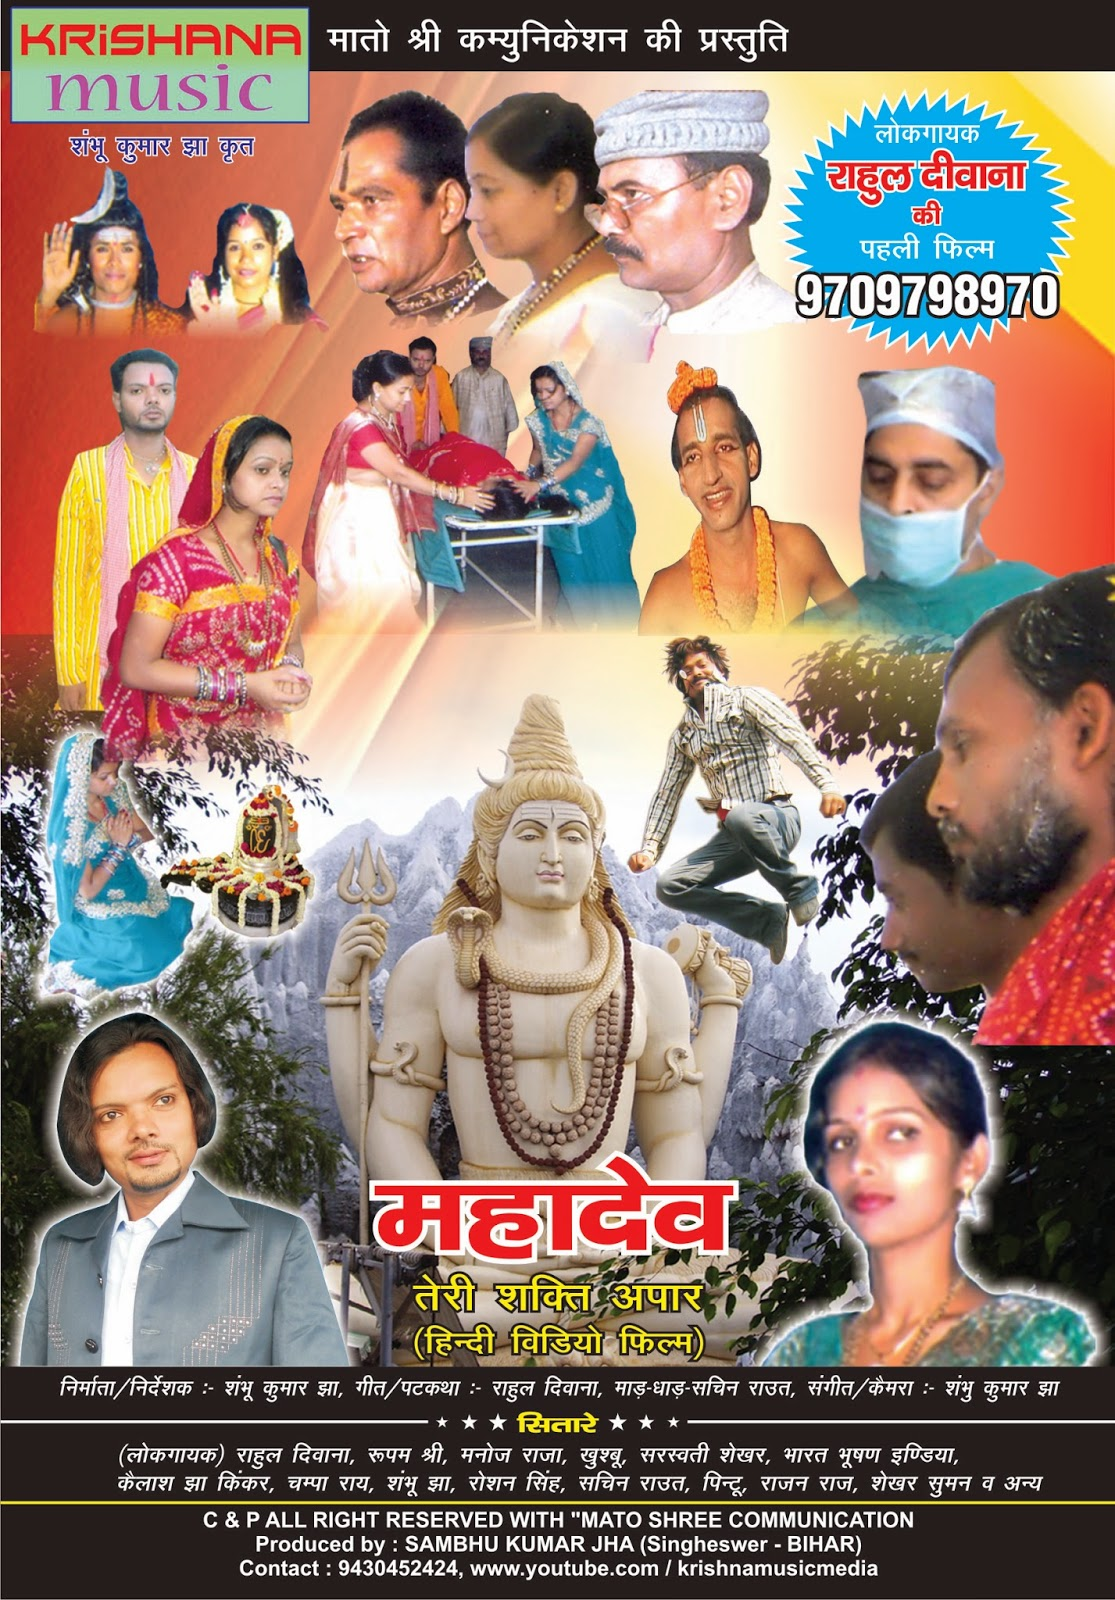 mahadew teri shakti apar _ www.krishanamusic.com